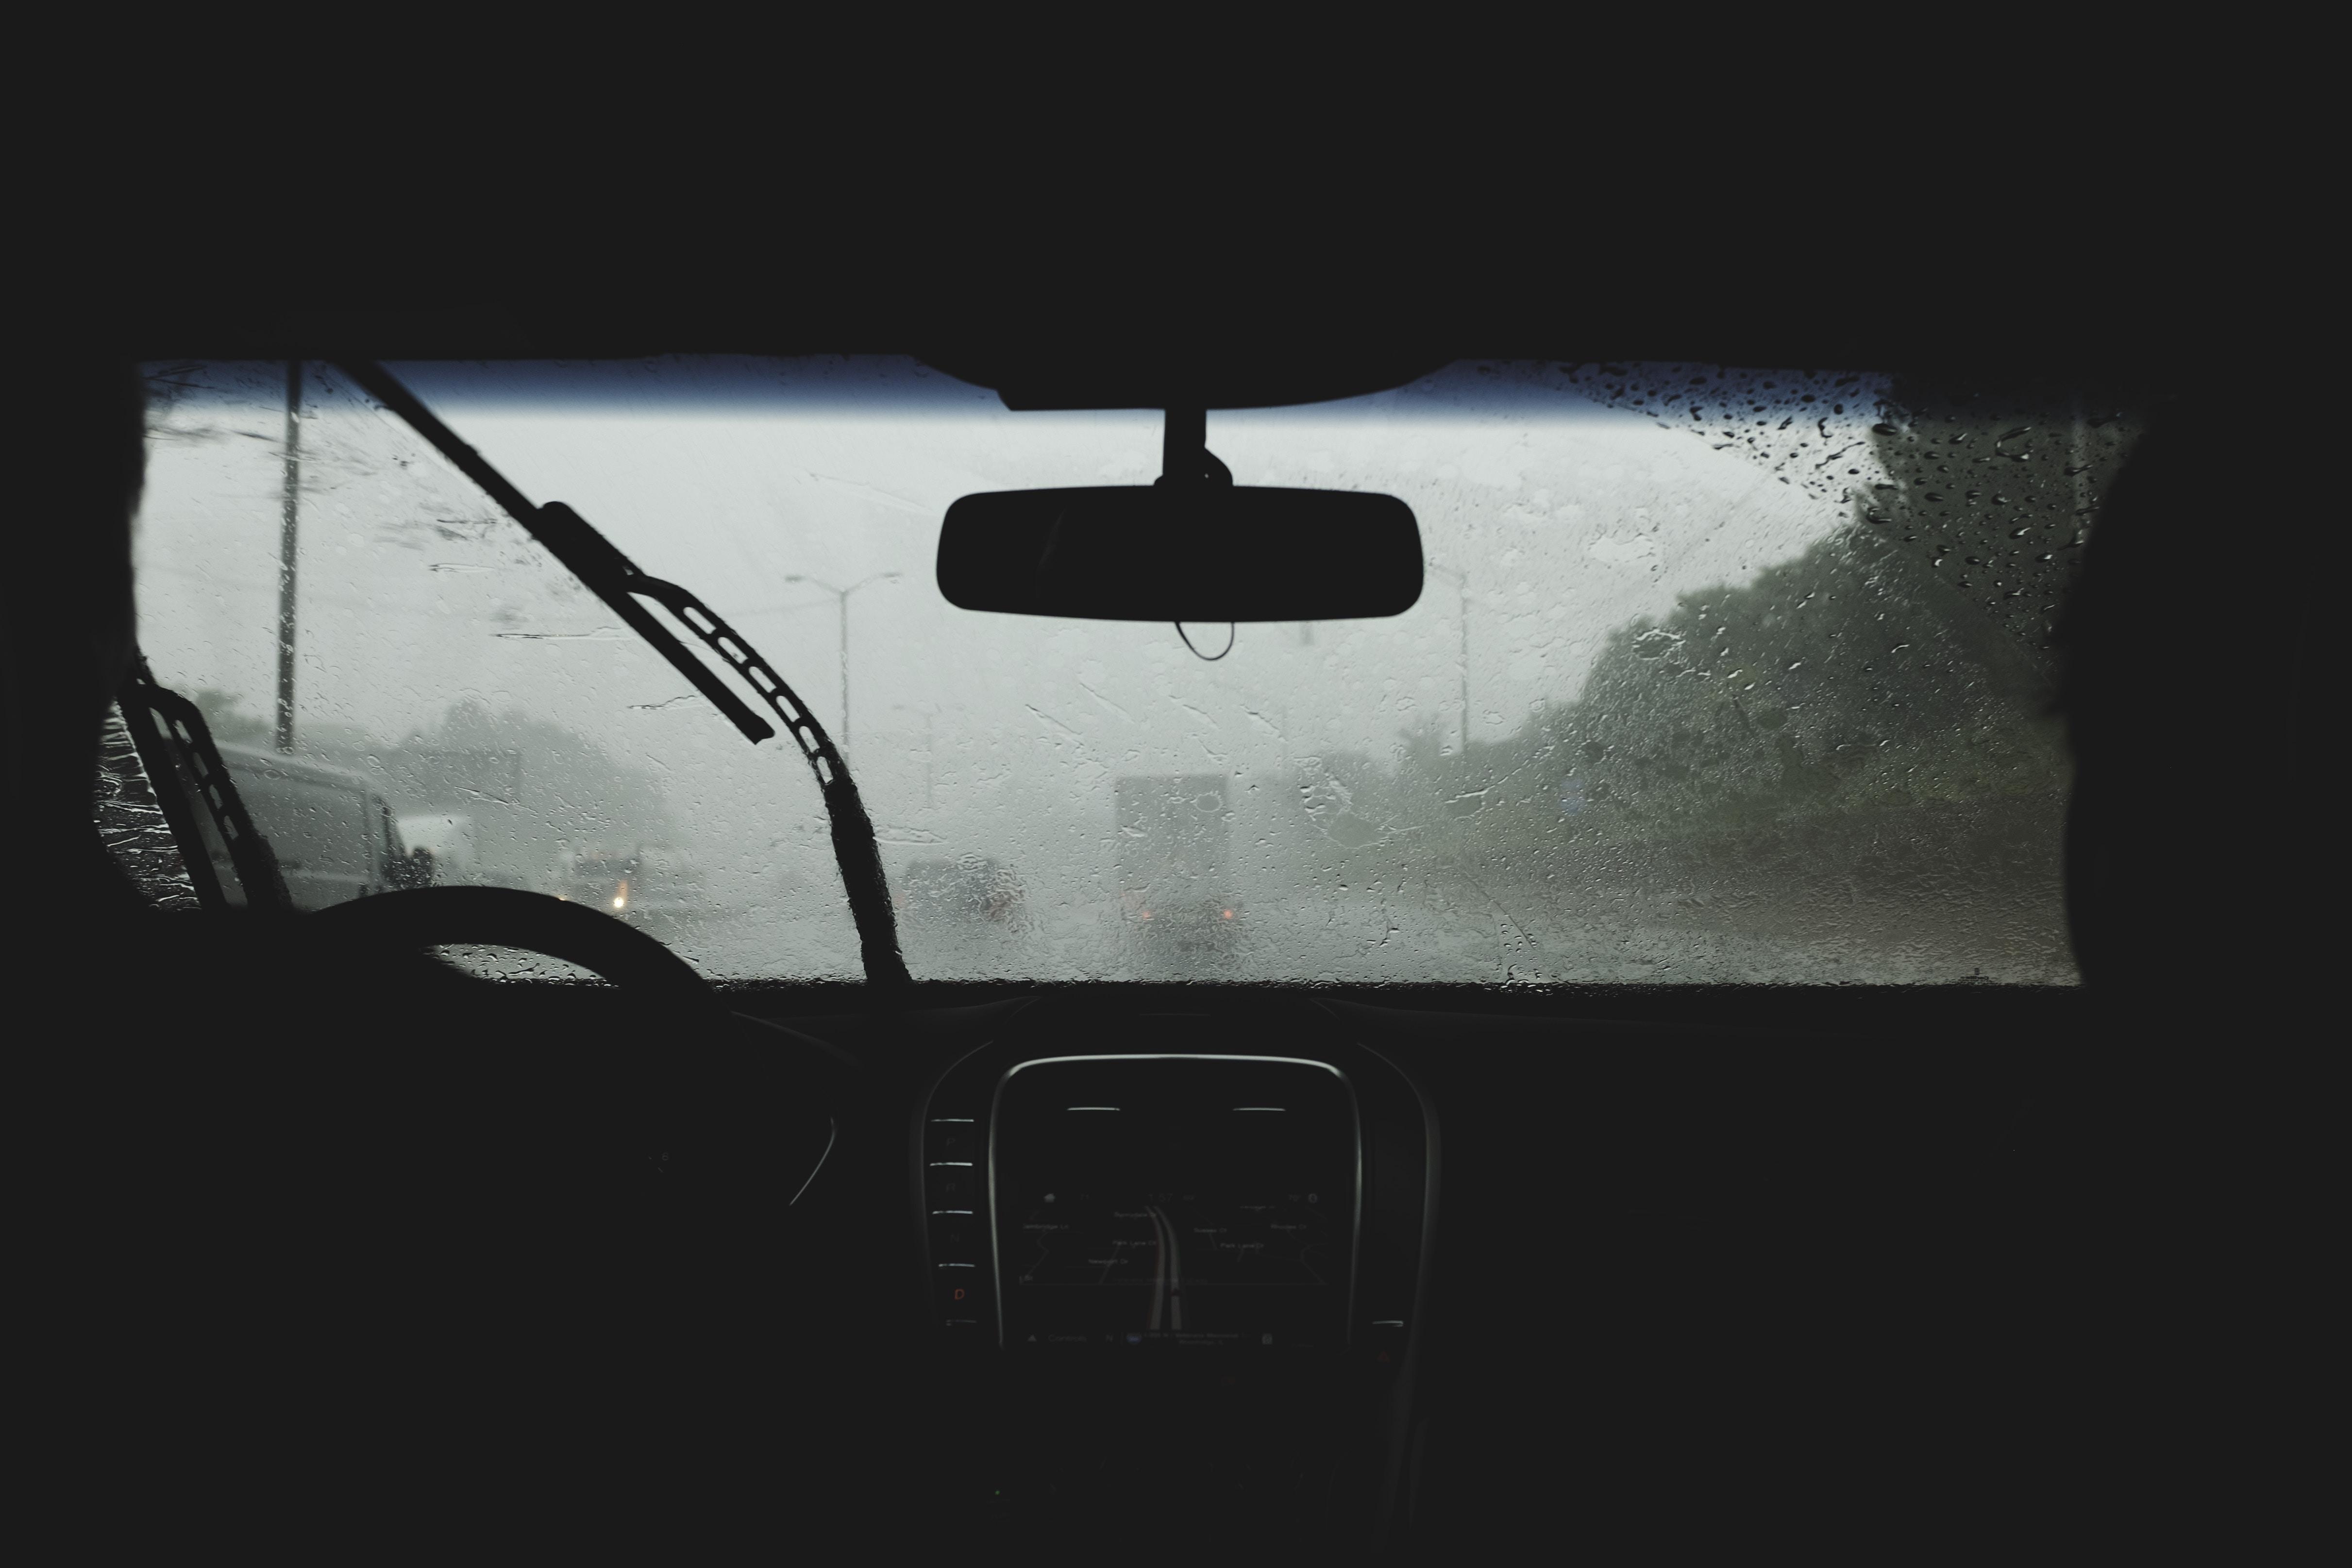 in my car sobbing stories